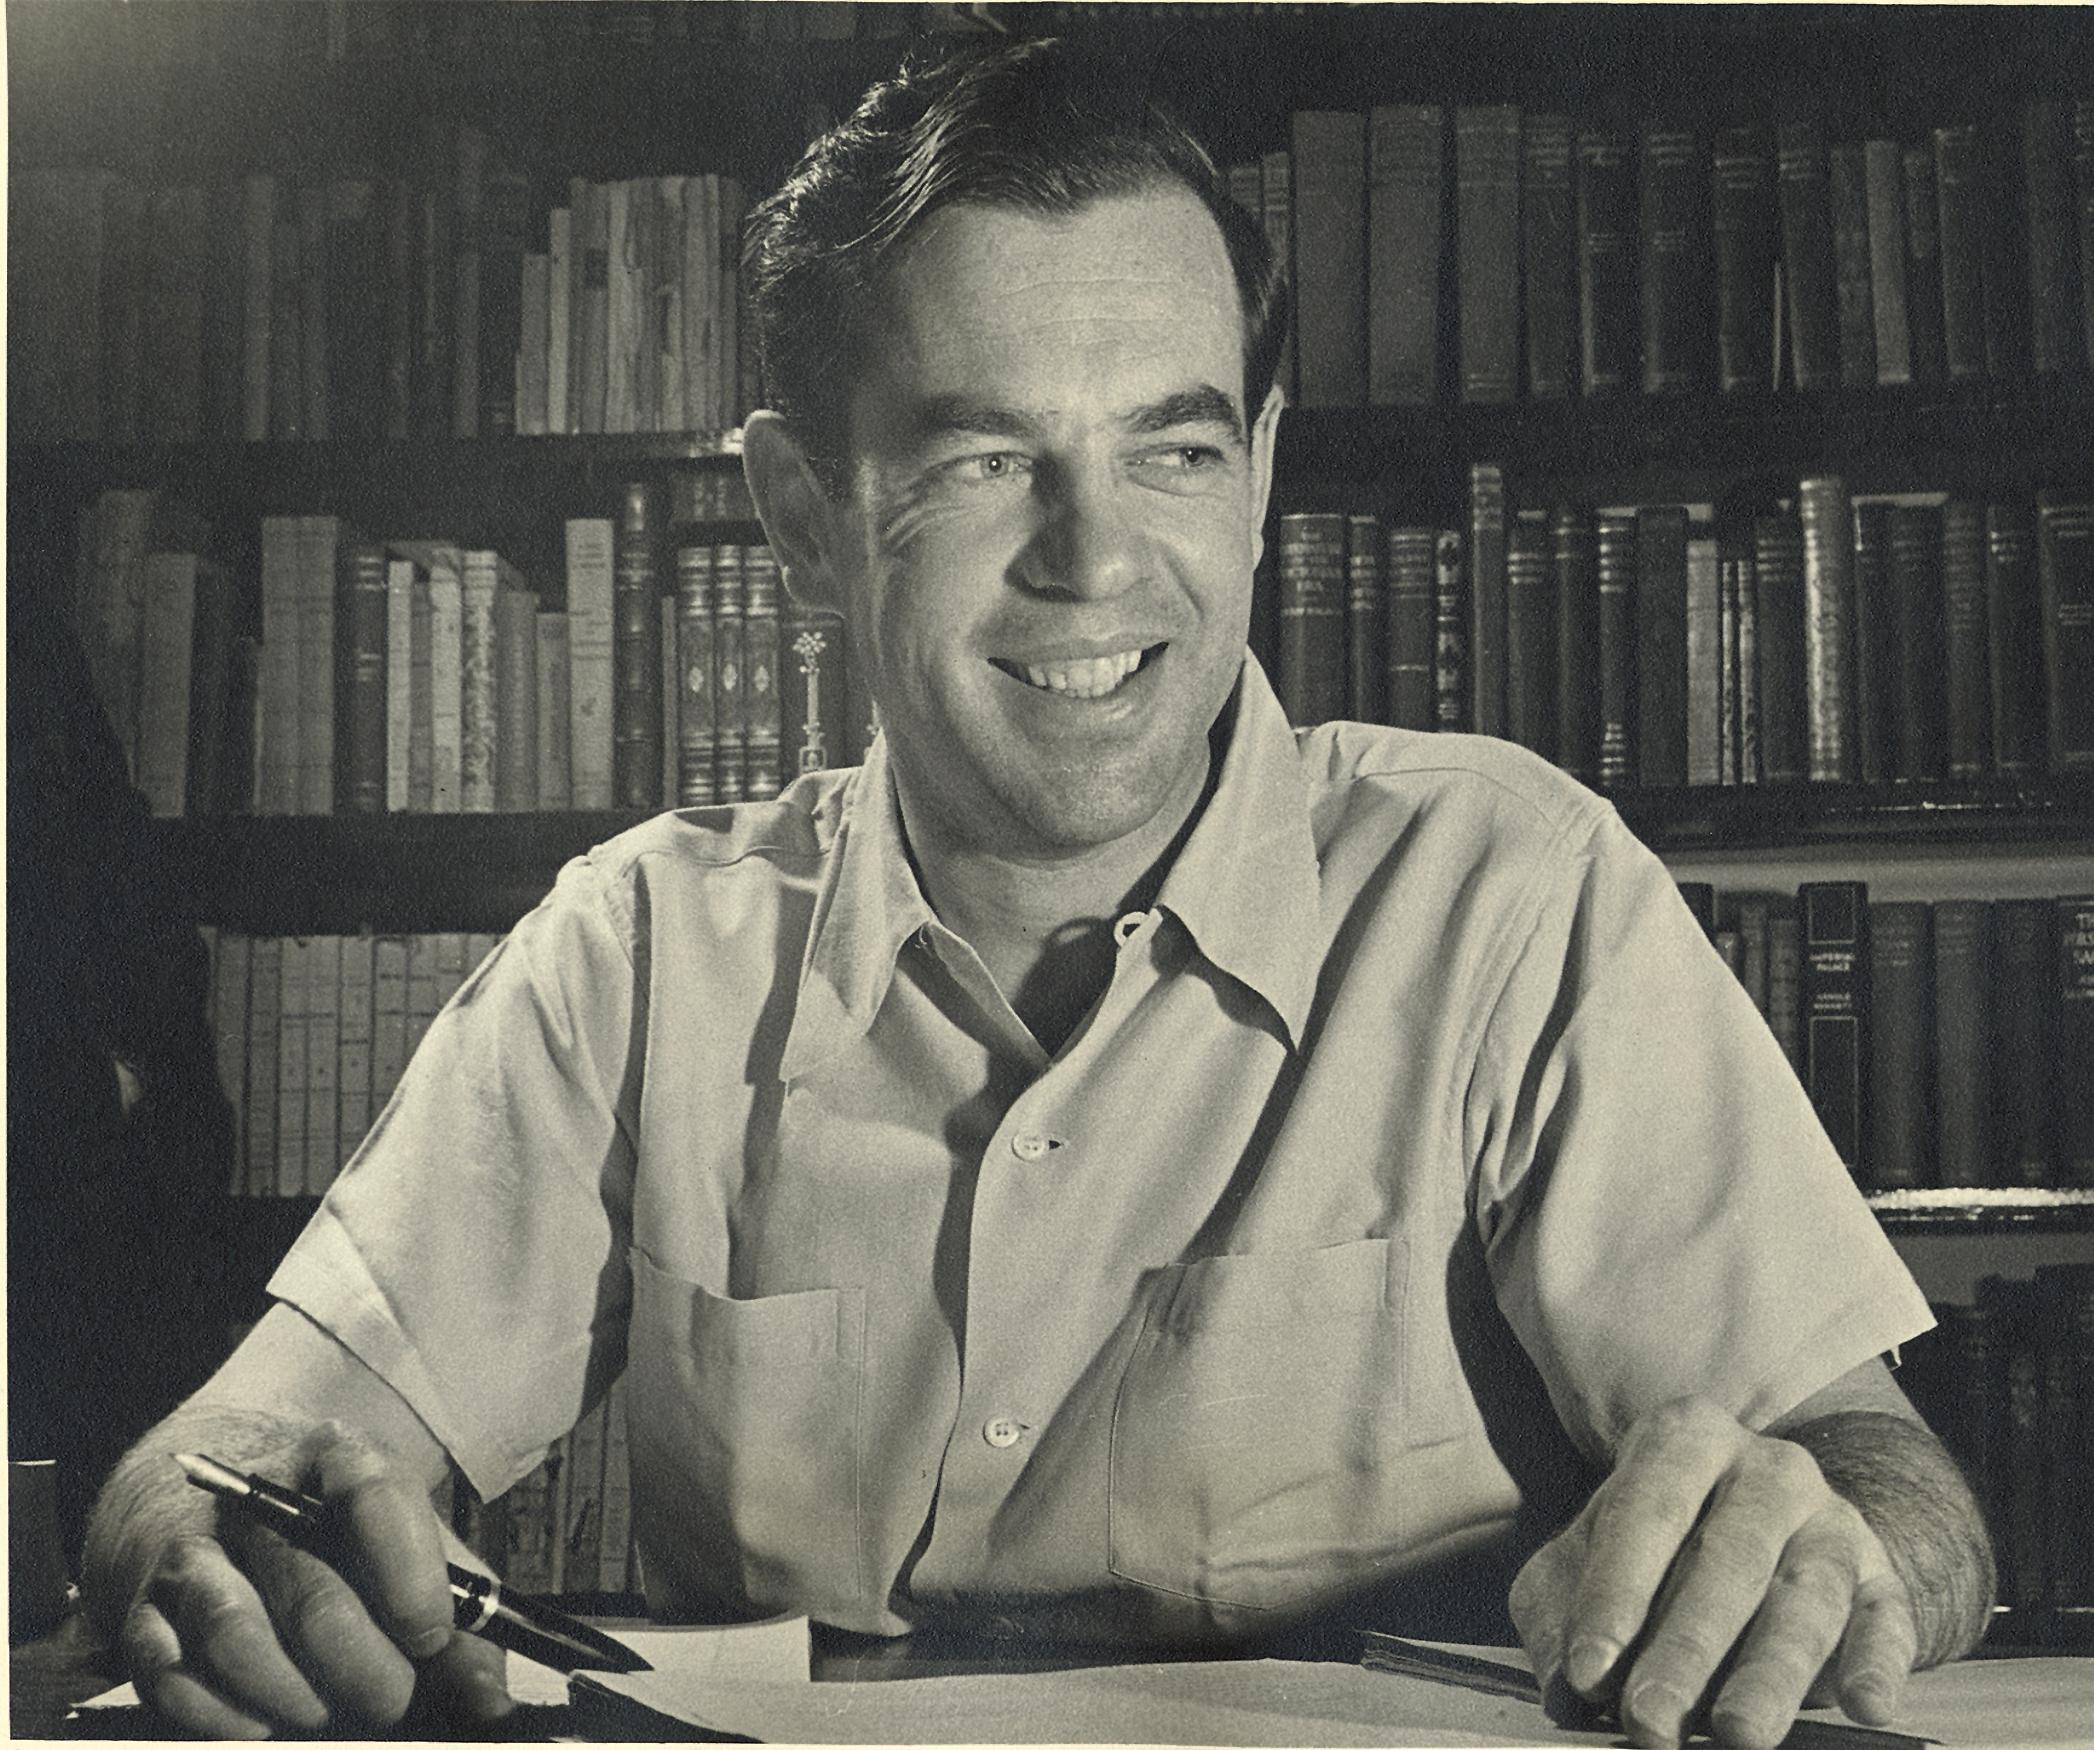 Joseph Campbell & The Hero's Journey